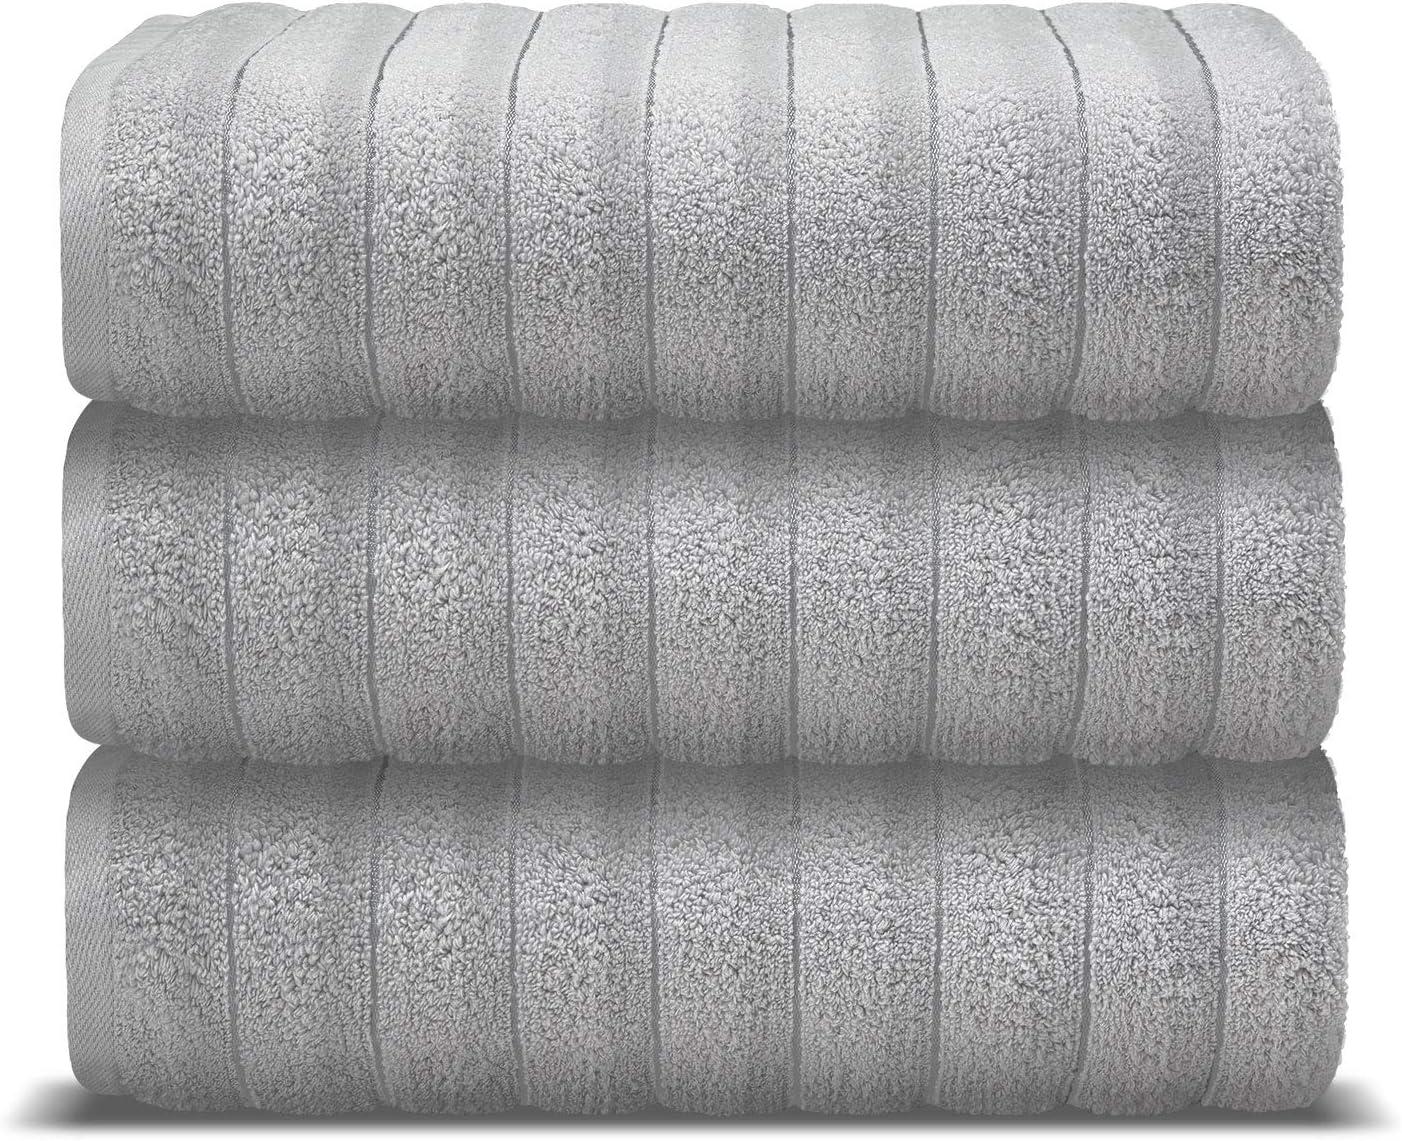 AROW9 Luxury Bath Towels 3 Pack 100% Turkish Cotton – Premium Quality Decorative Absorbent & Soft - Fancy Home Guest Bathroom & Spa Towel - Elegant Jacquard ''Piles of Plush'' Design - Silver Gray